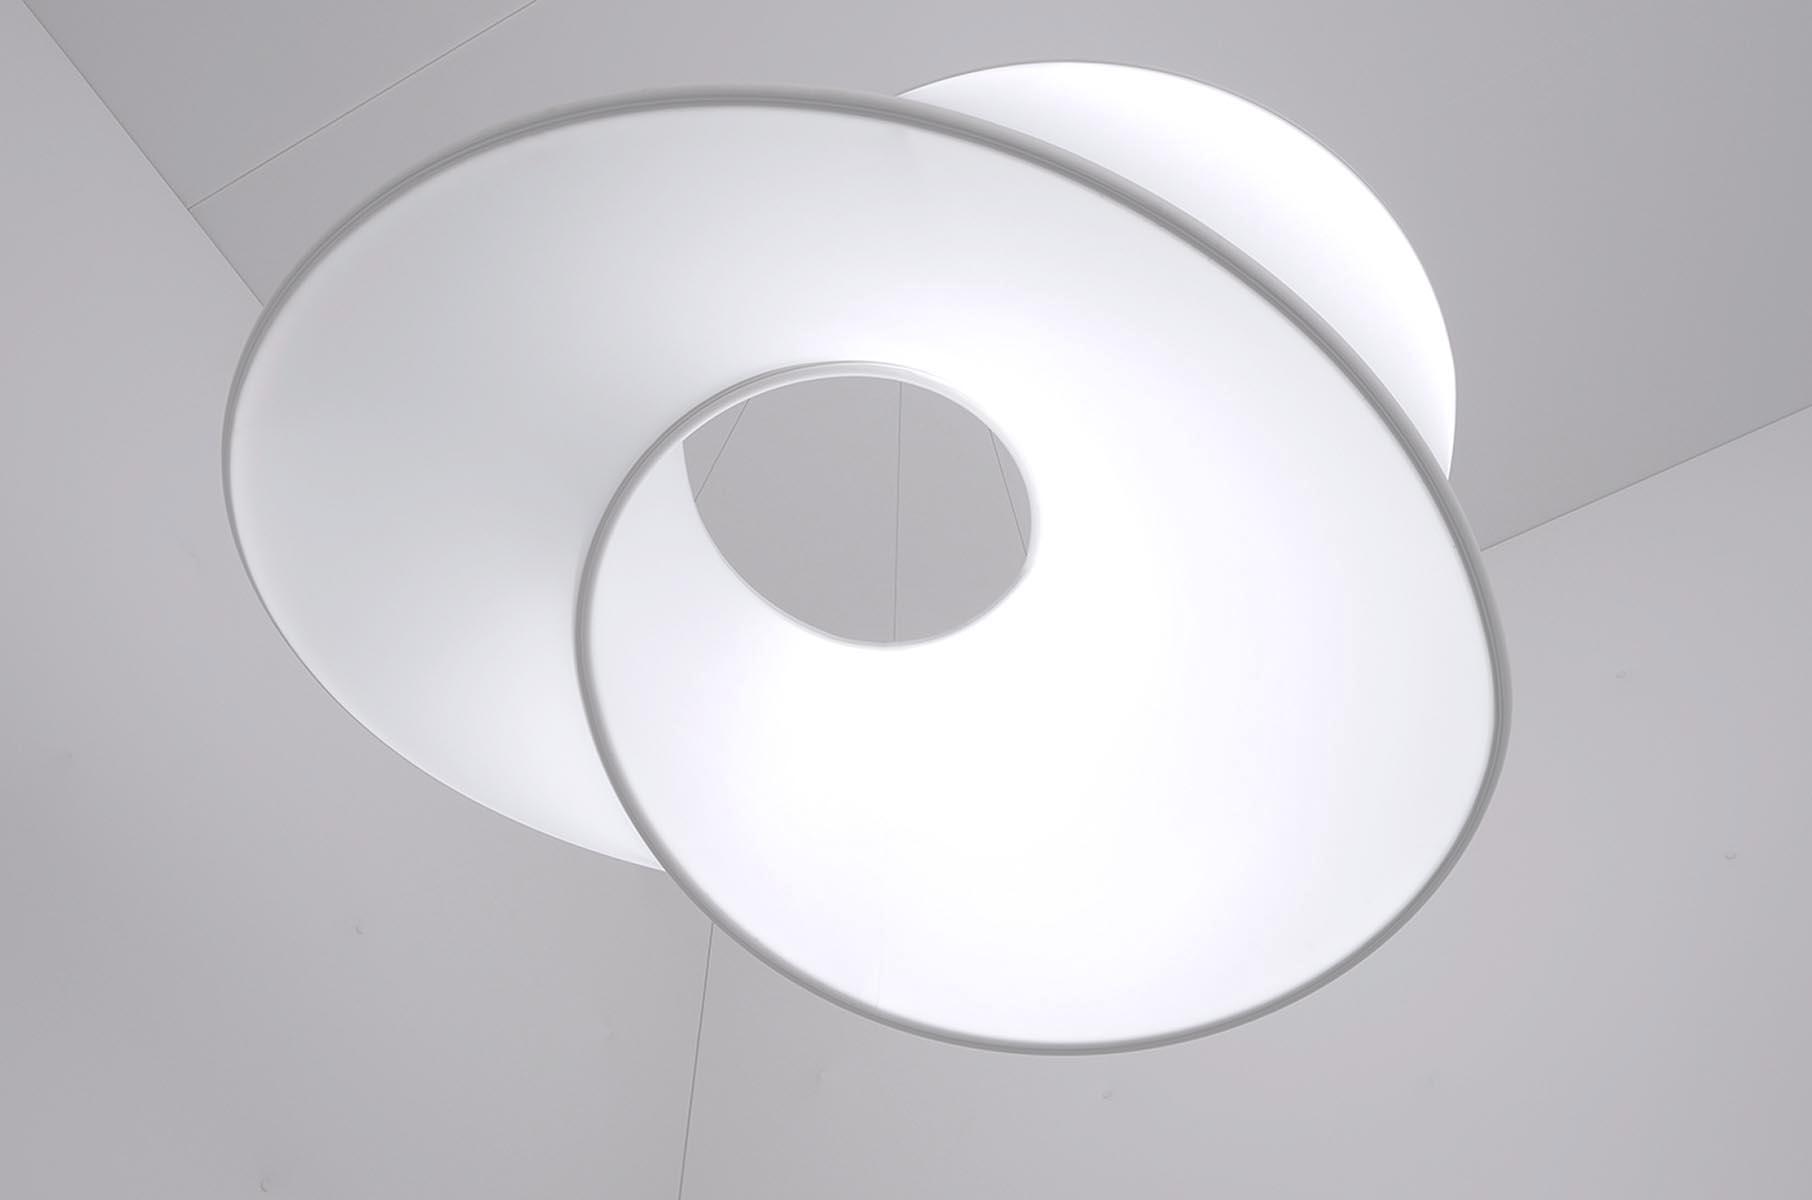 barrisol-infinite-loop-ross-lovegrove-computational-design-andrea-locatelli-05.jpg